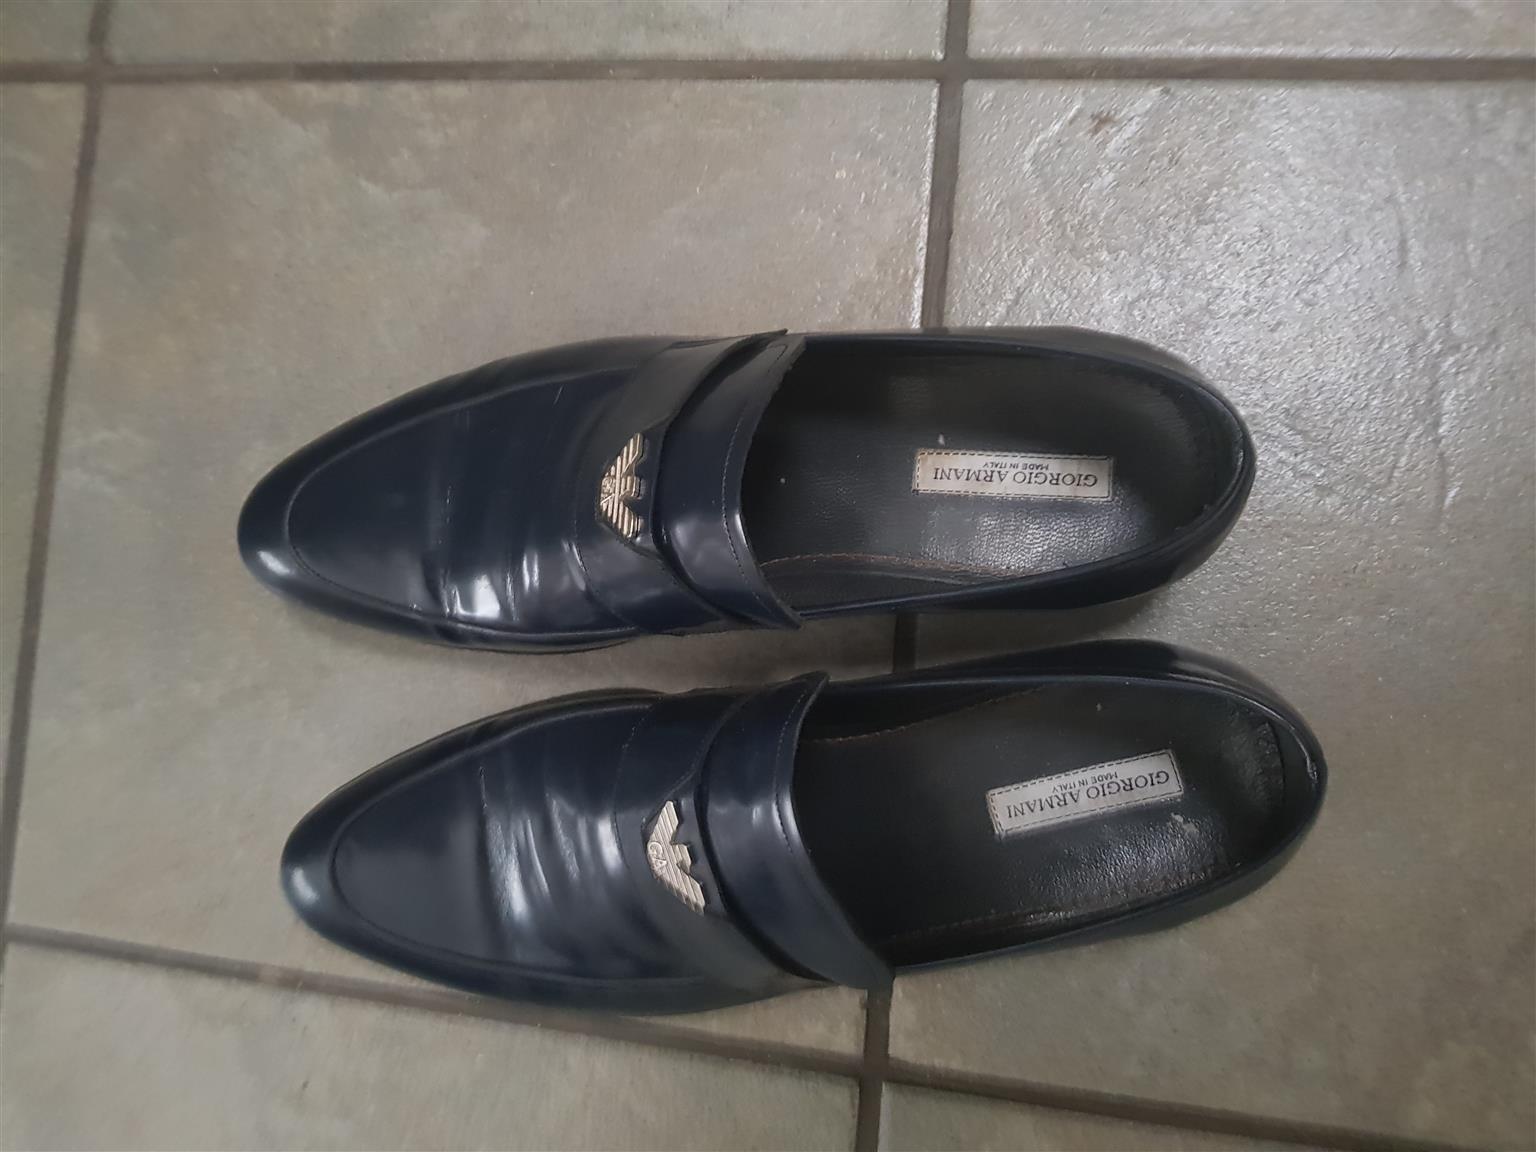 Men's  formal shoes (good labels on both shoes)